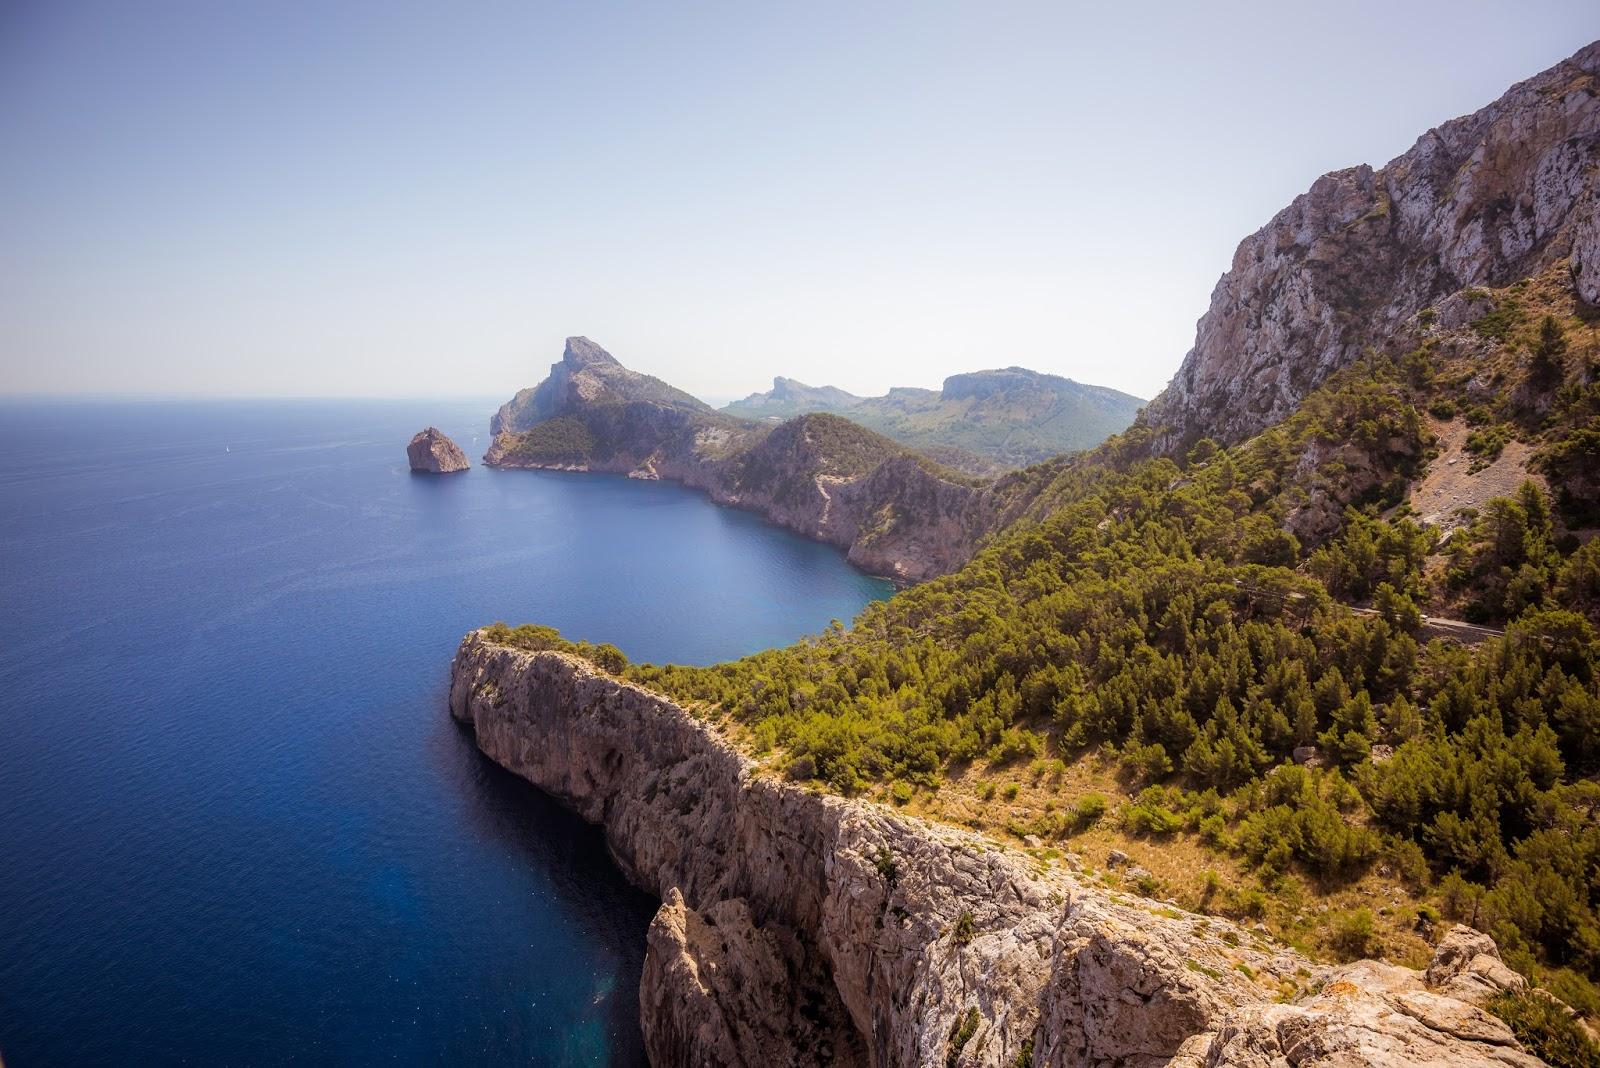 Views of Sa Foradada Mallorca